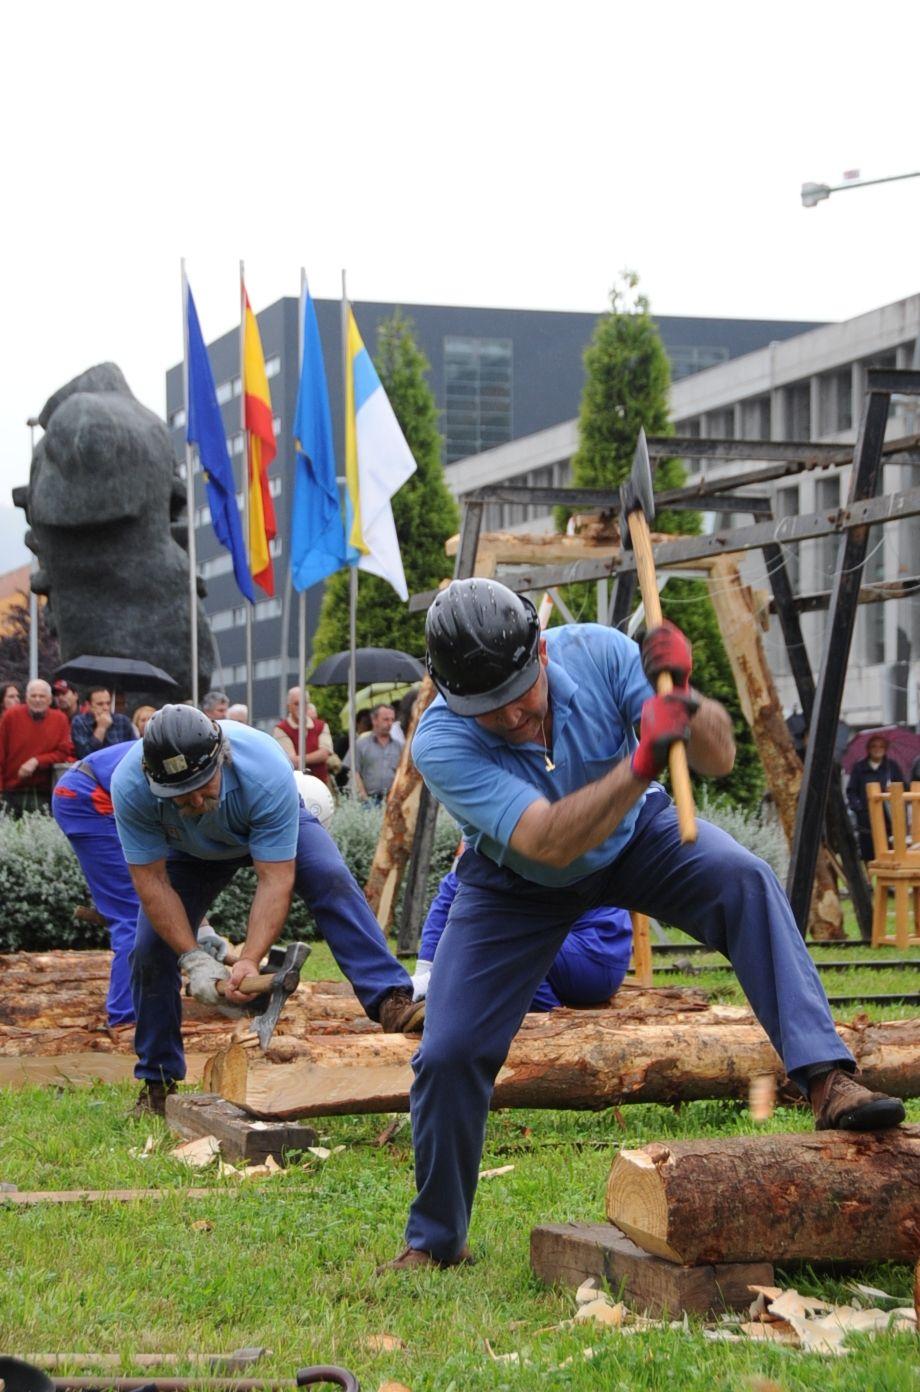 Madre Eru Via Homenaje Al Campo Asturianu Asturias Es  # Muebles Boj Siero